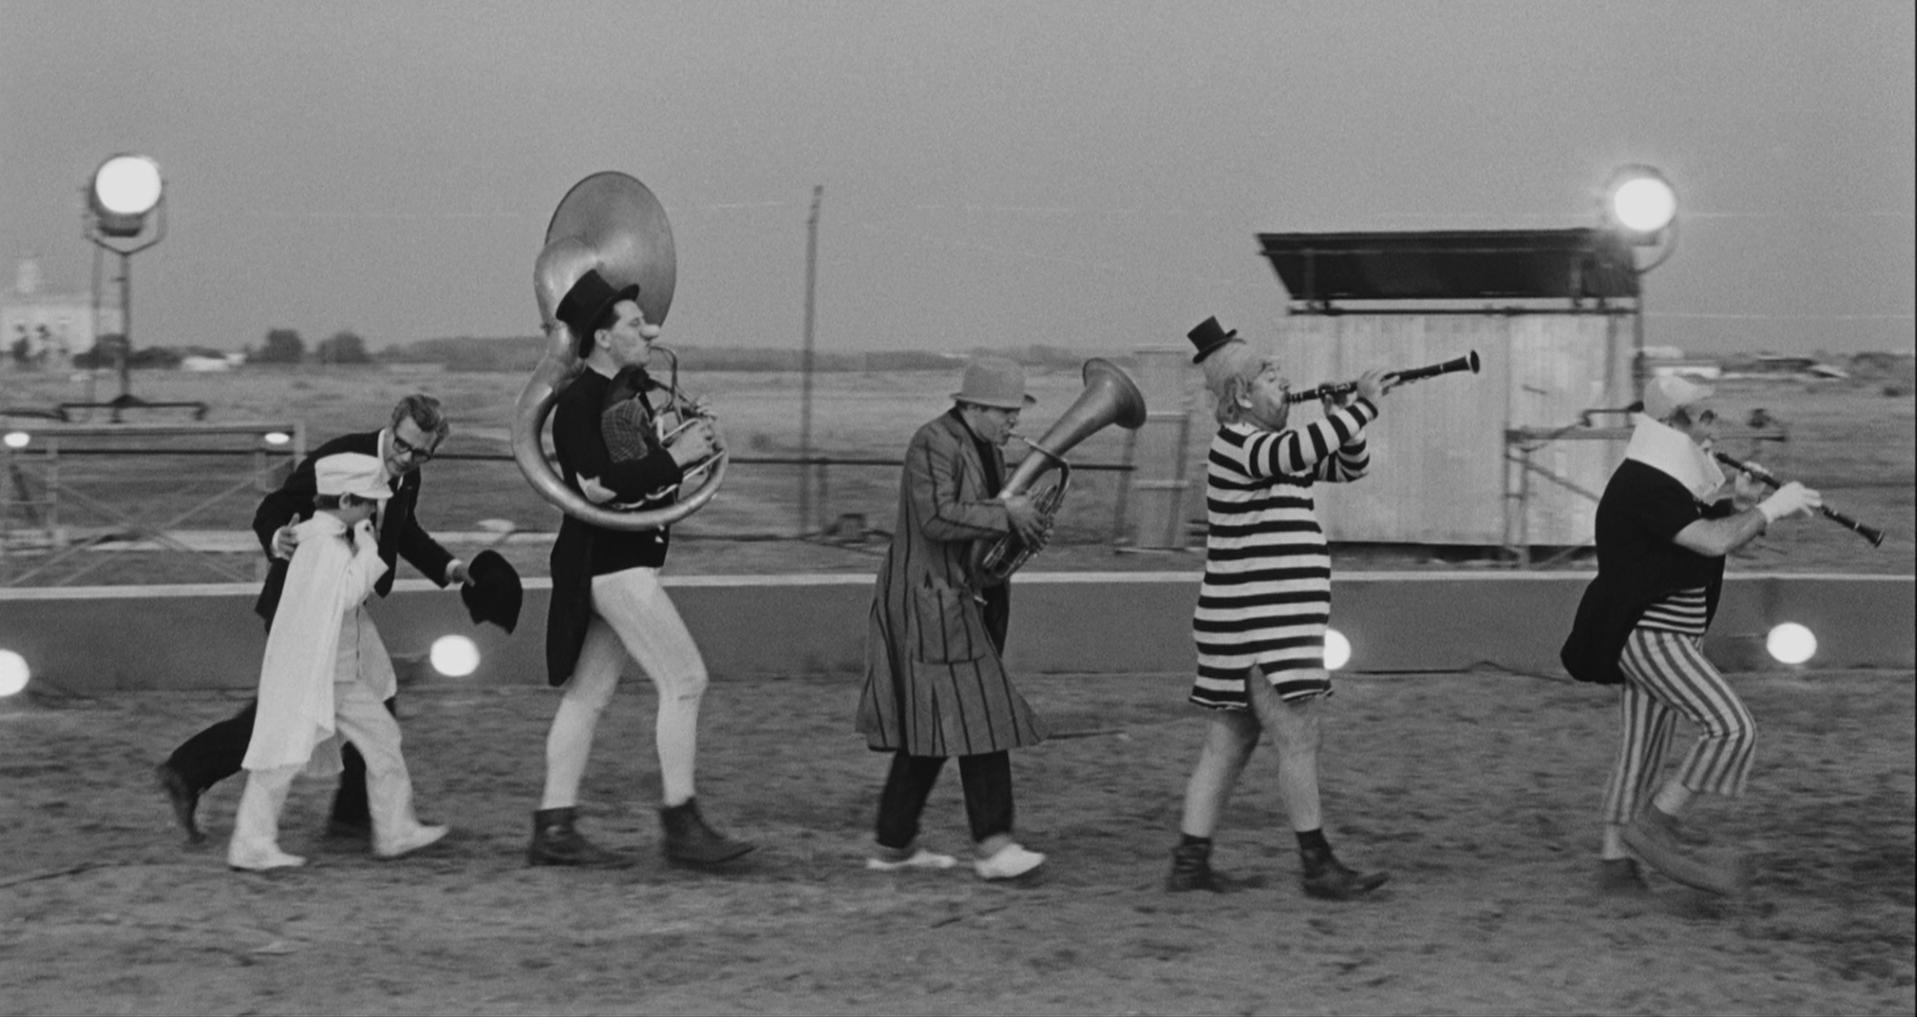 8 1/2 circus performers